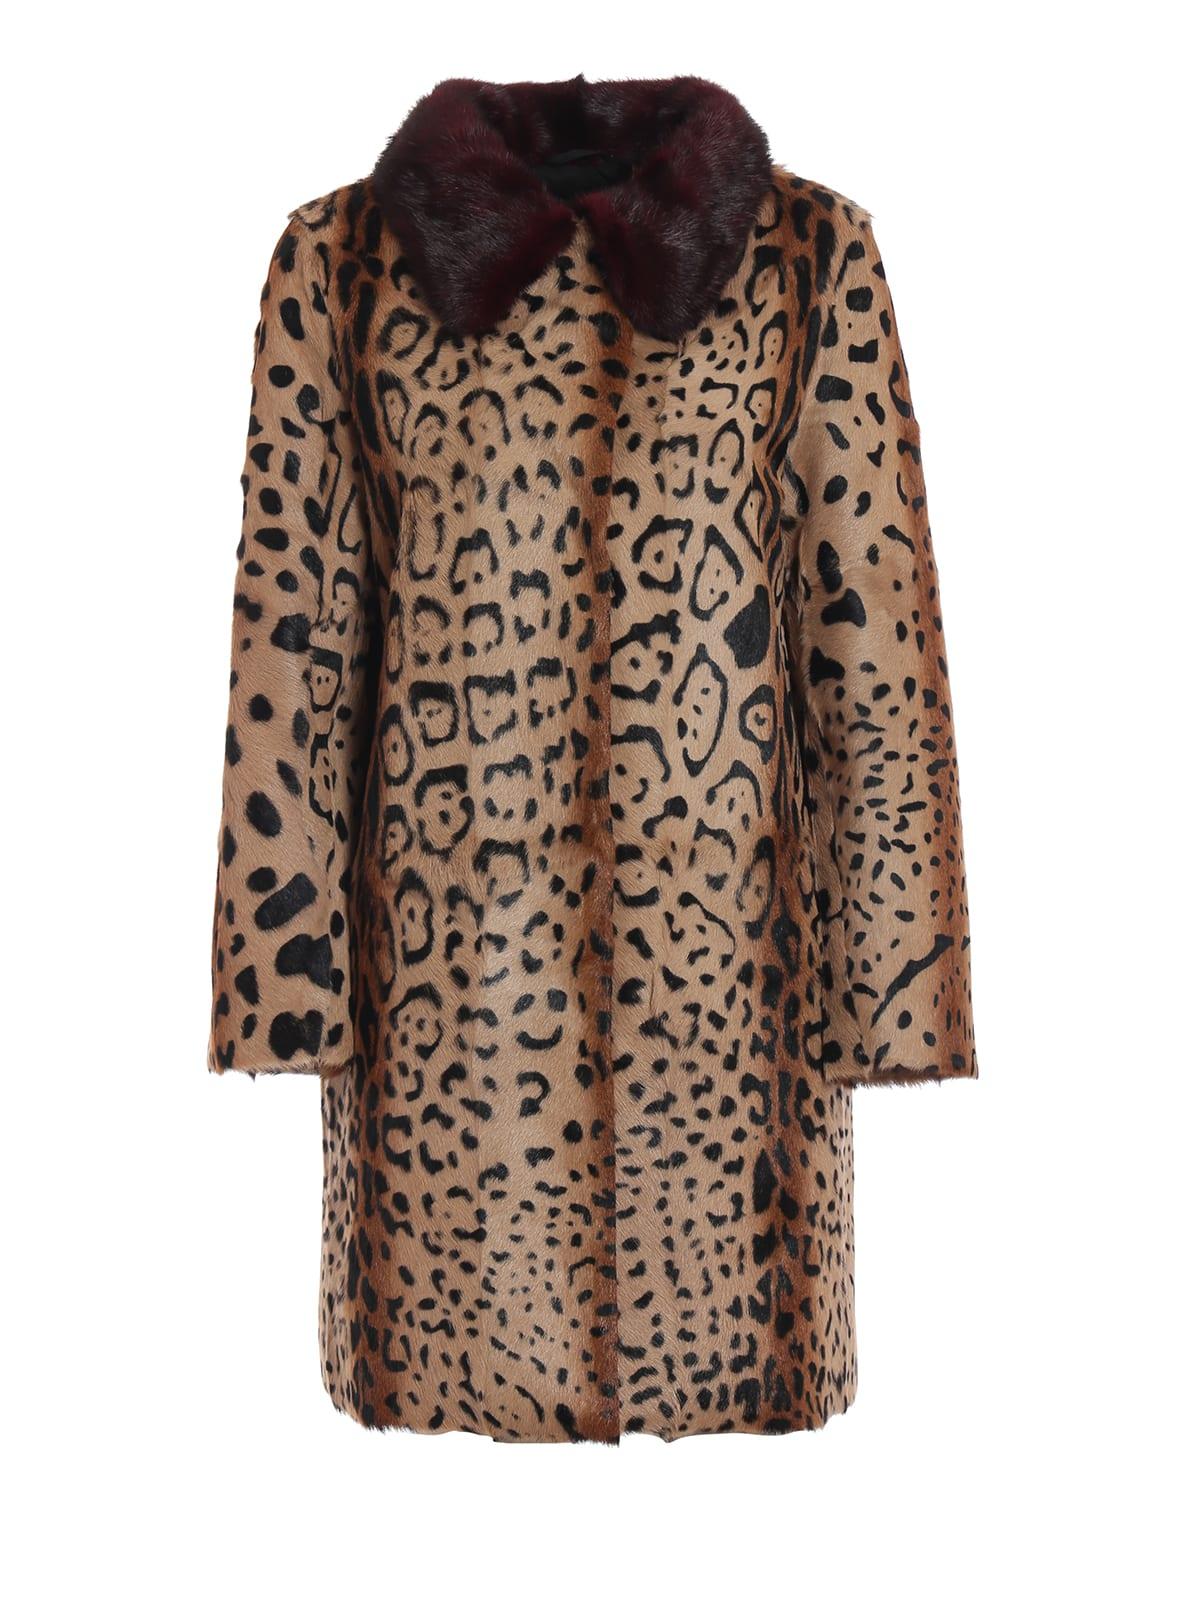 S.W.O.R.D 6.6.44 Leopard Print Detail Coat